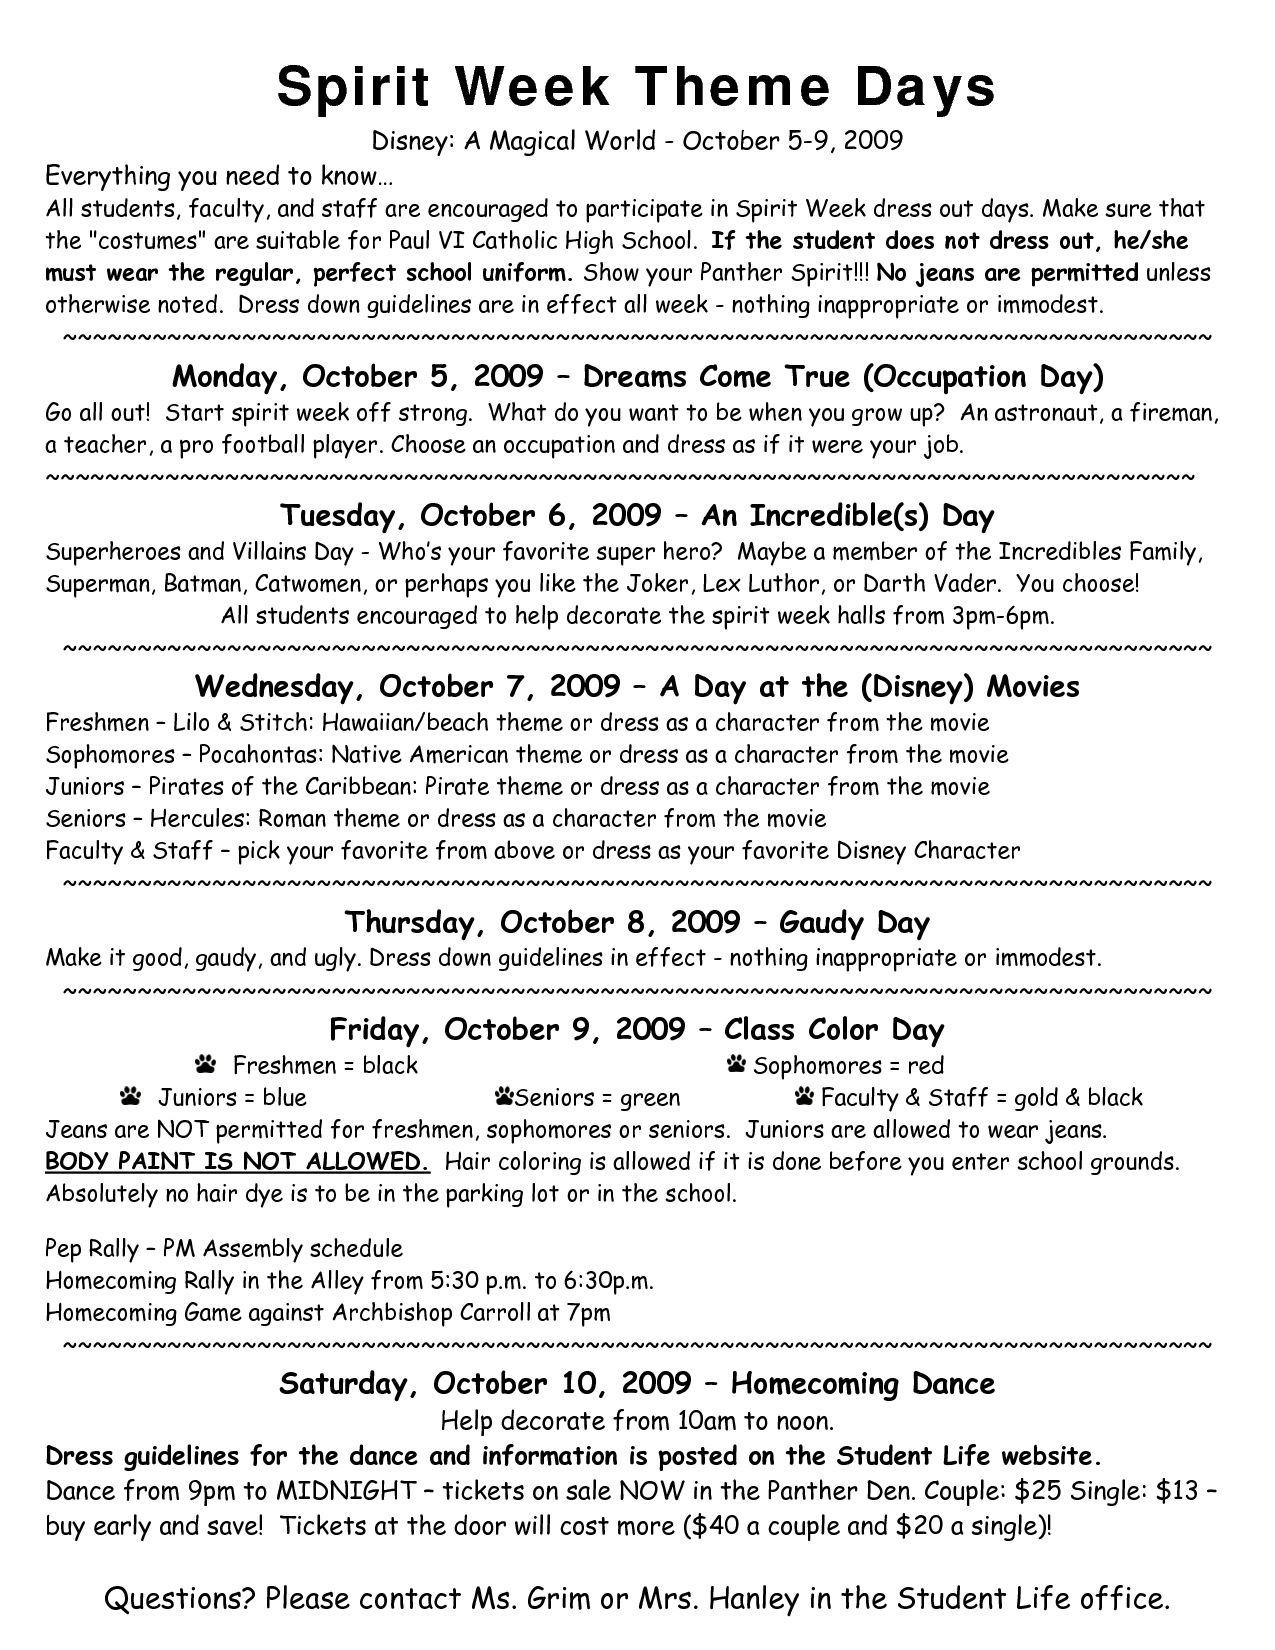 Spirit Week Theme Days | School spirit week, Spirit week themes, Catholic schools week